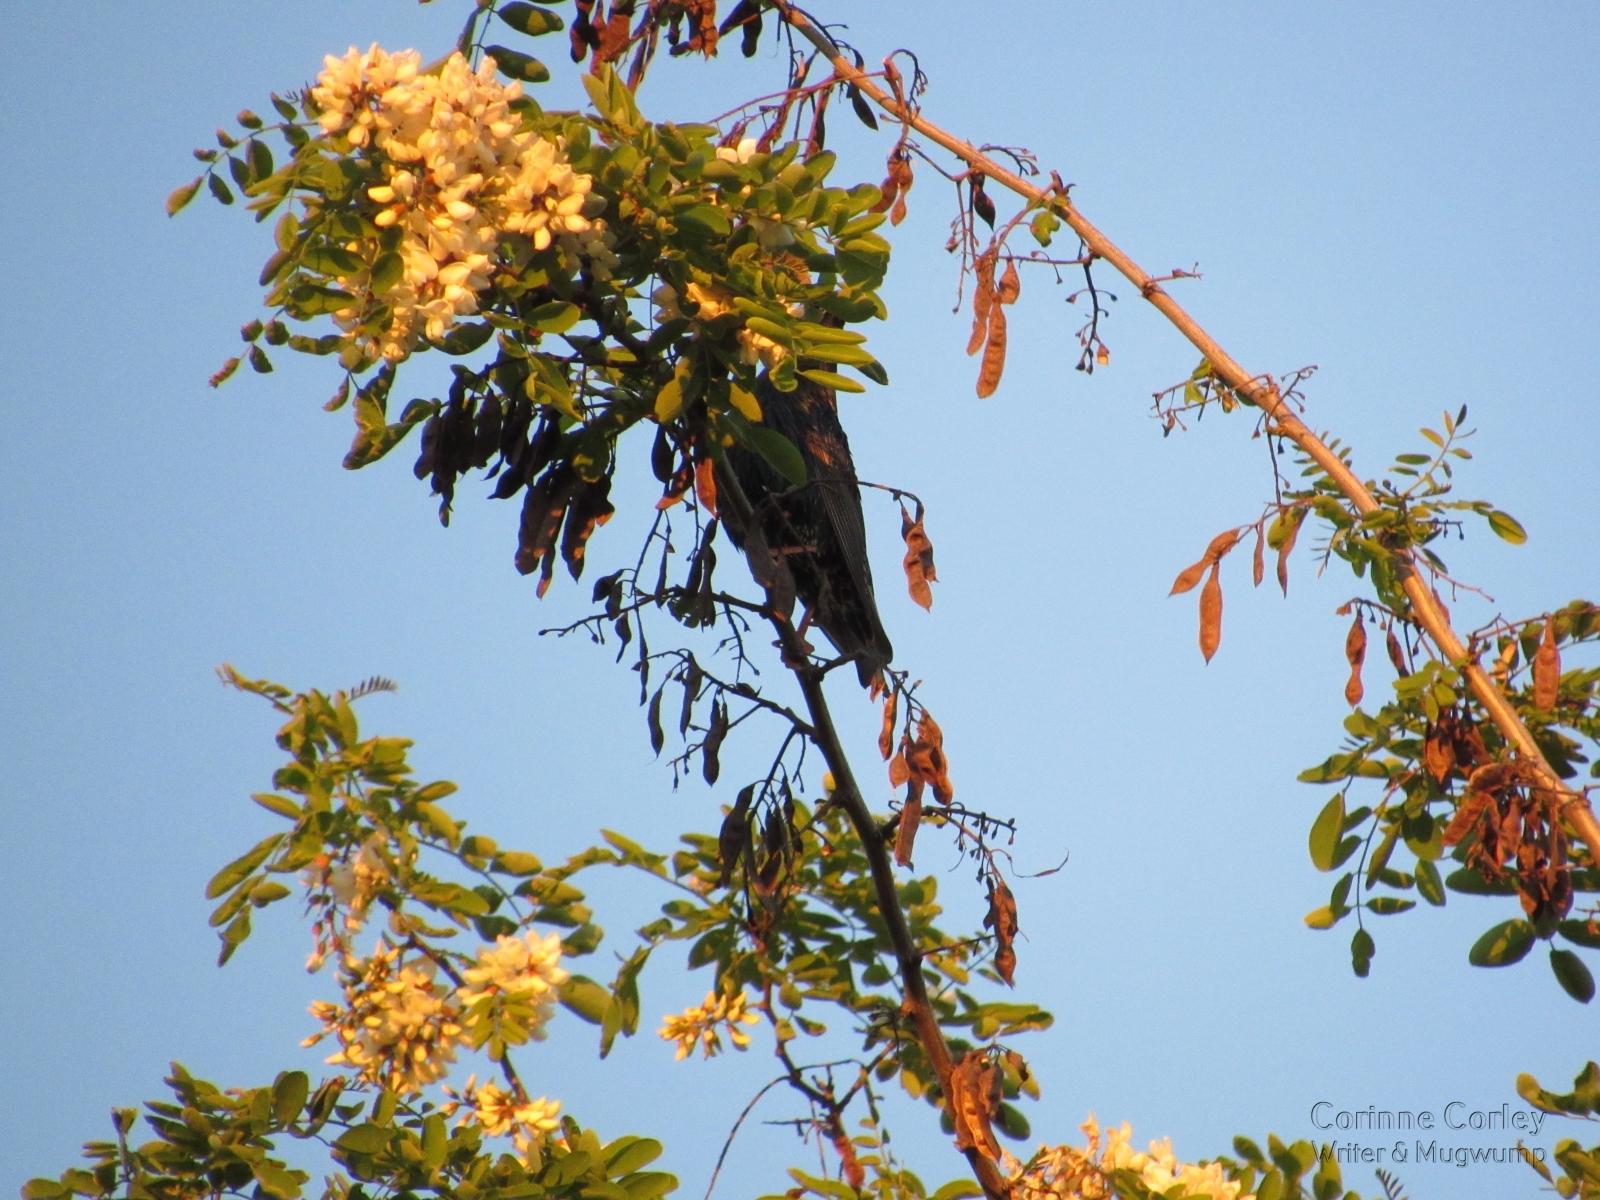 Shy-bird-in-a-treetop